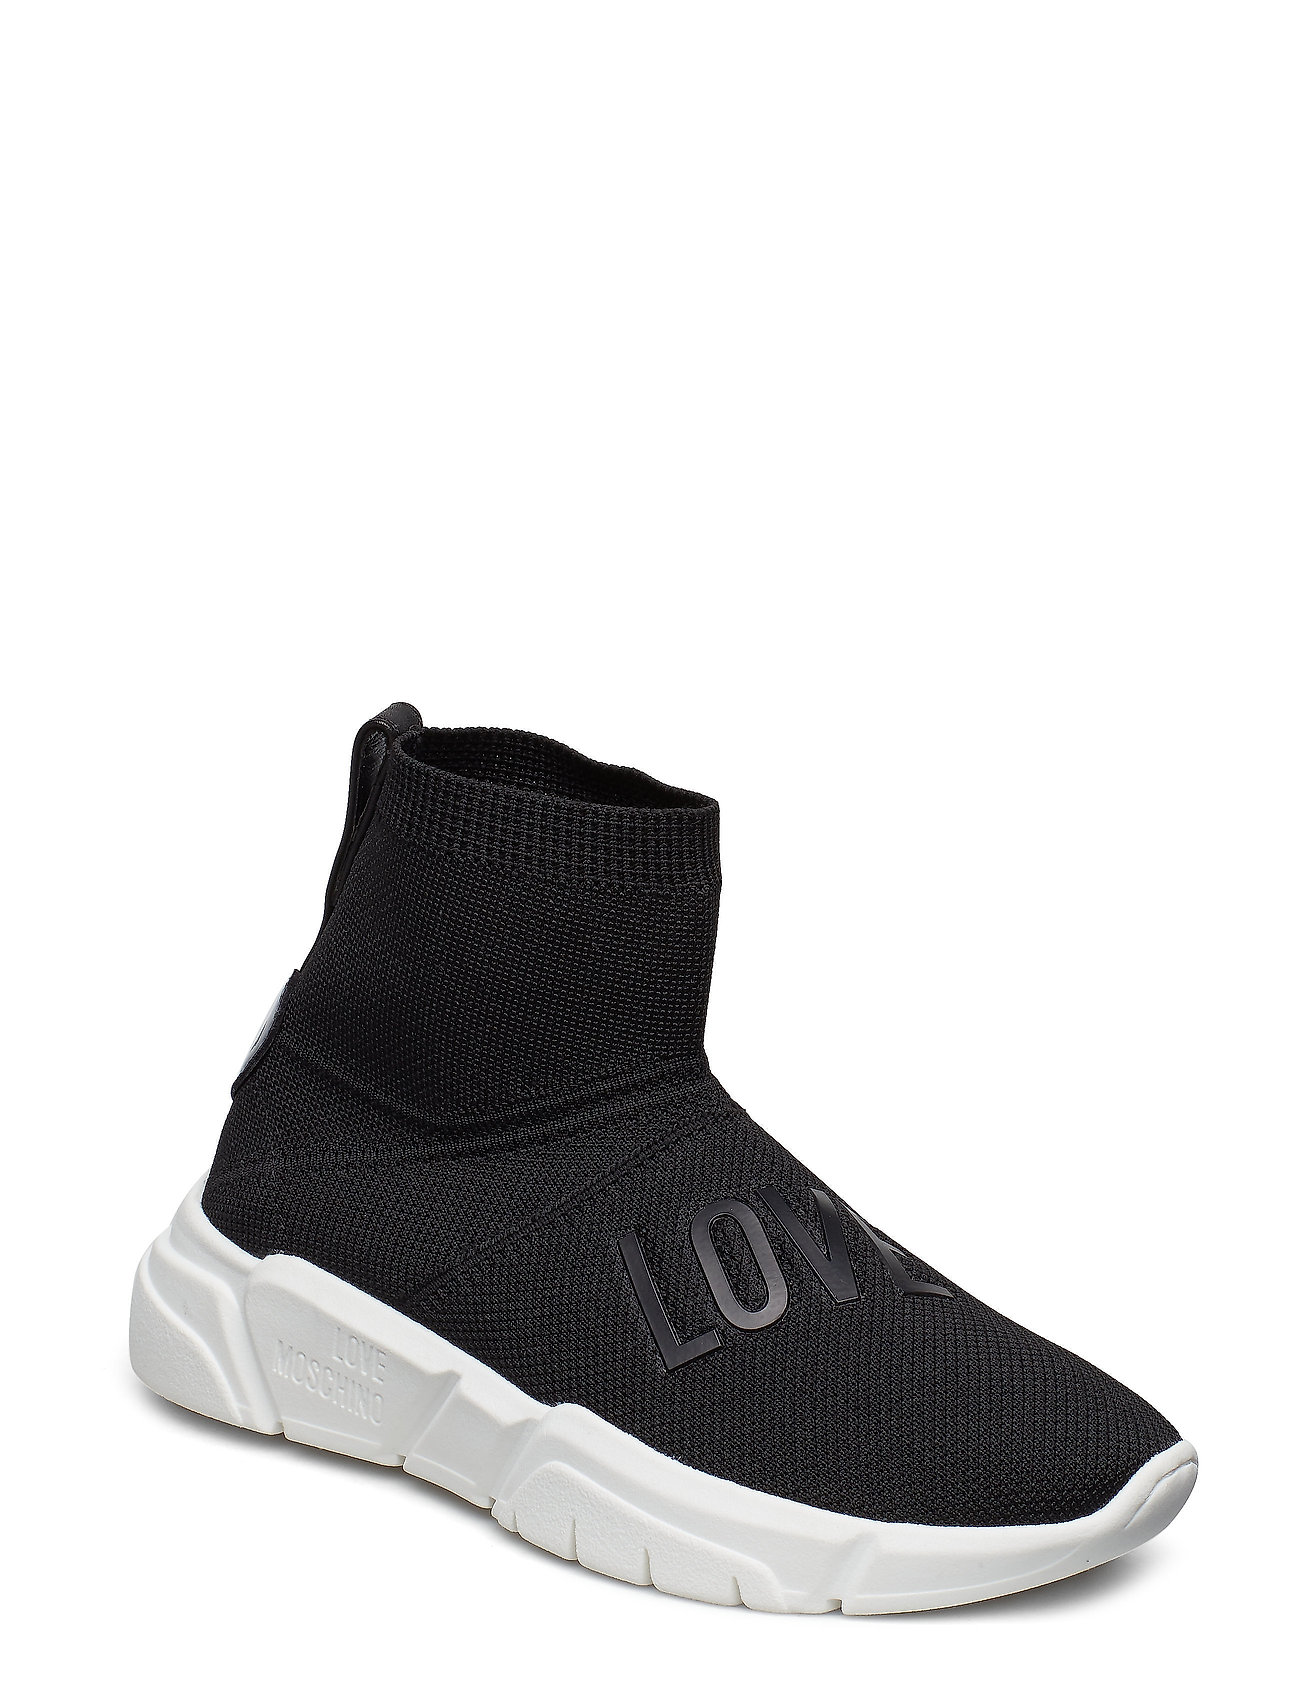 080b026c60e Love Moschino Shoes High-top Sneakers Sort LOVE MOSCHINO